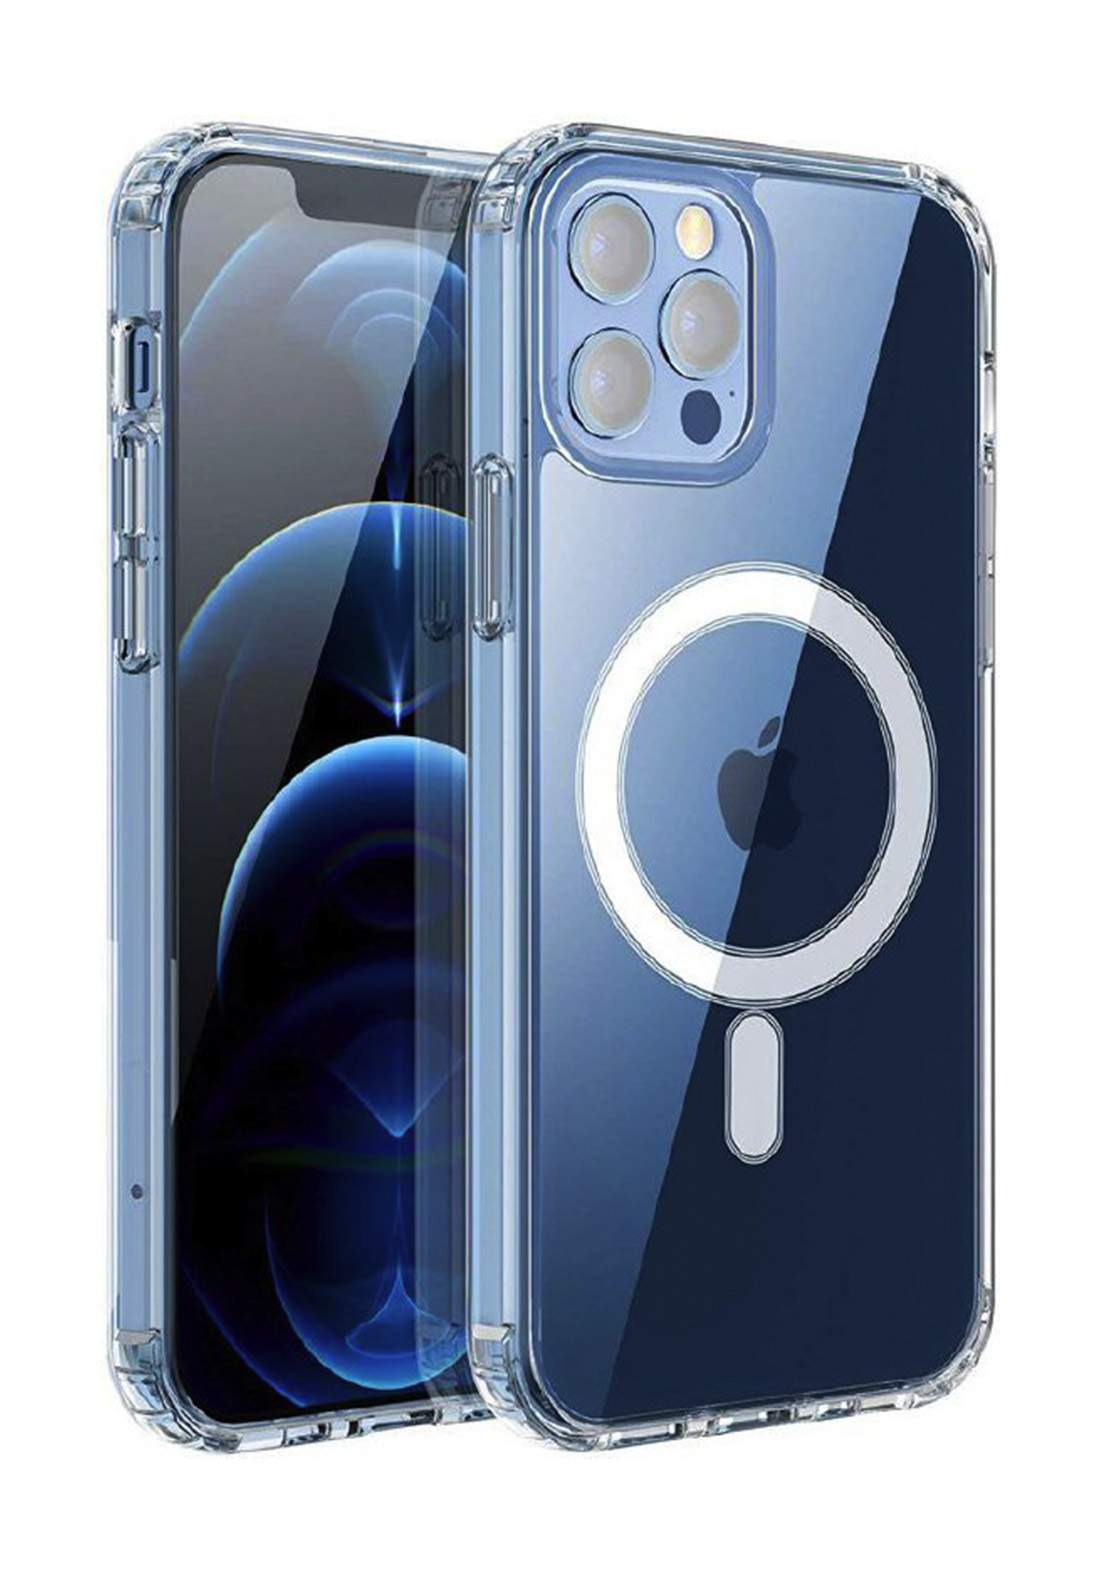 WIWU MCC-101 magnet  phone case For iPhone 12 Pro MAX حافظة موبايل شفافة